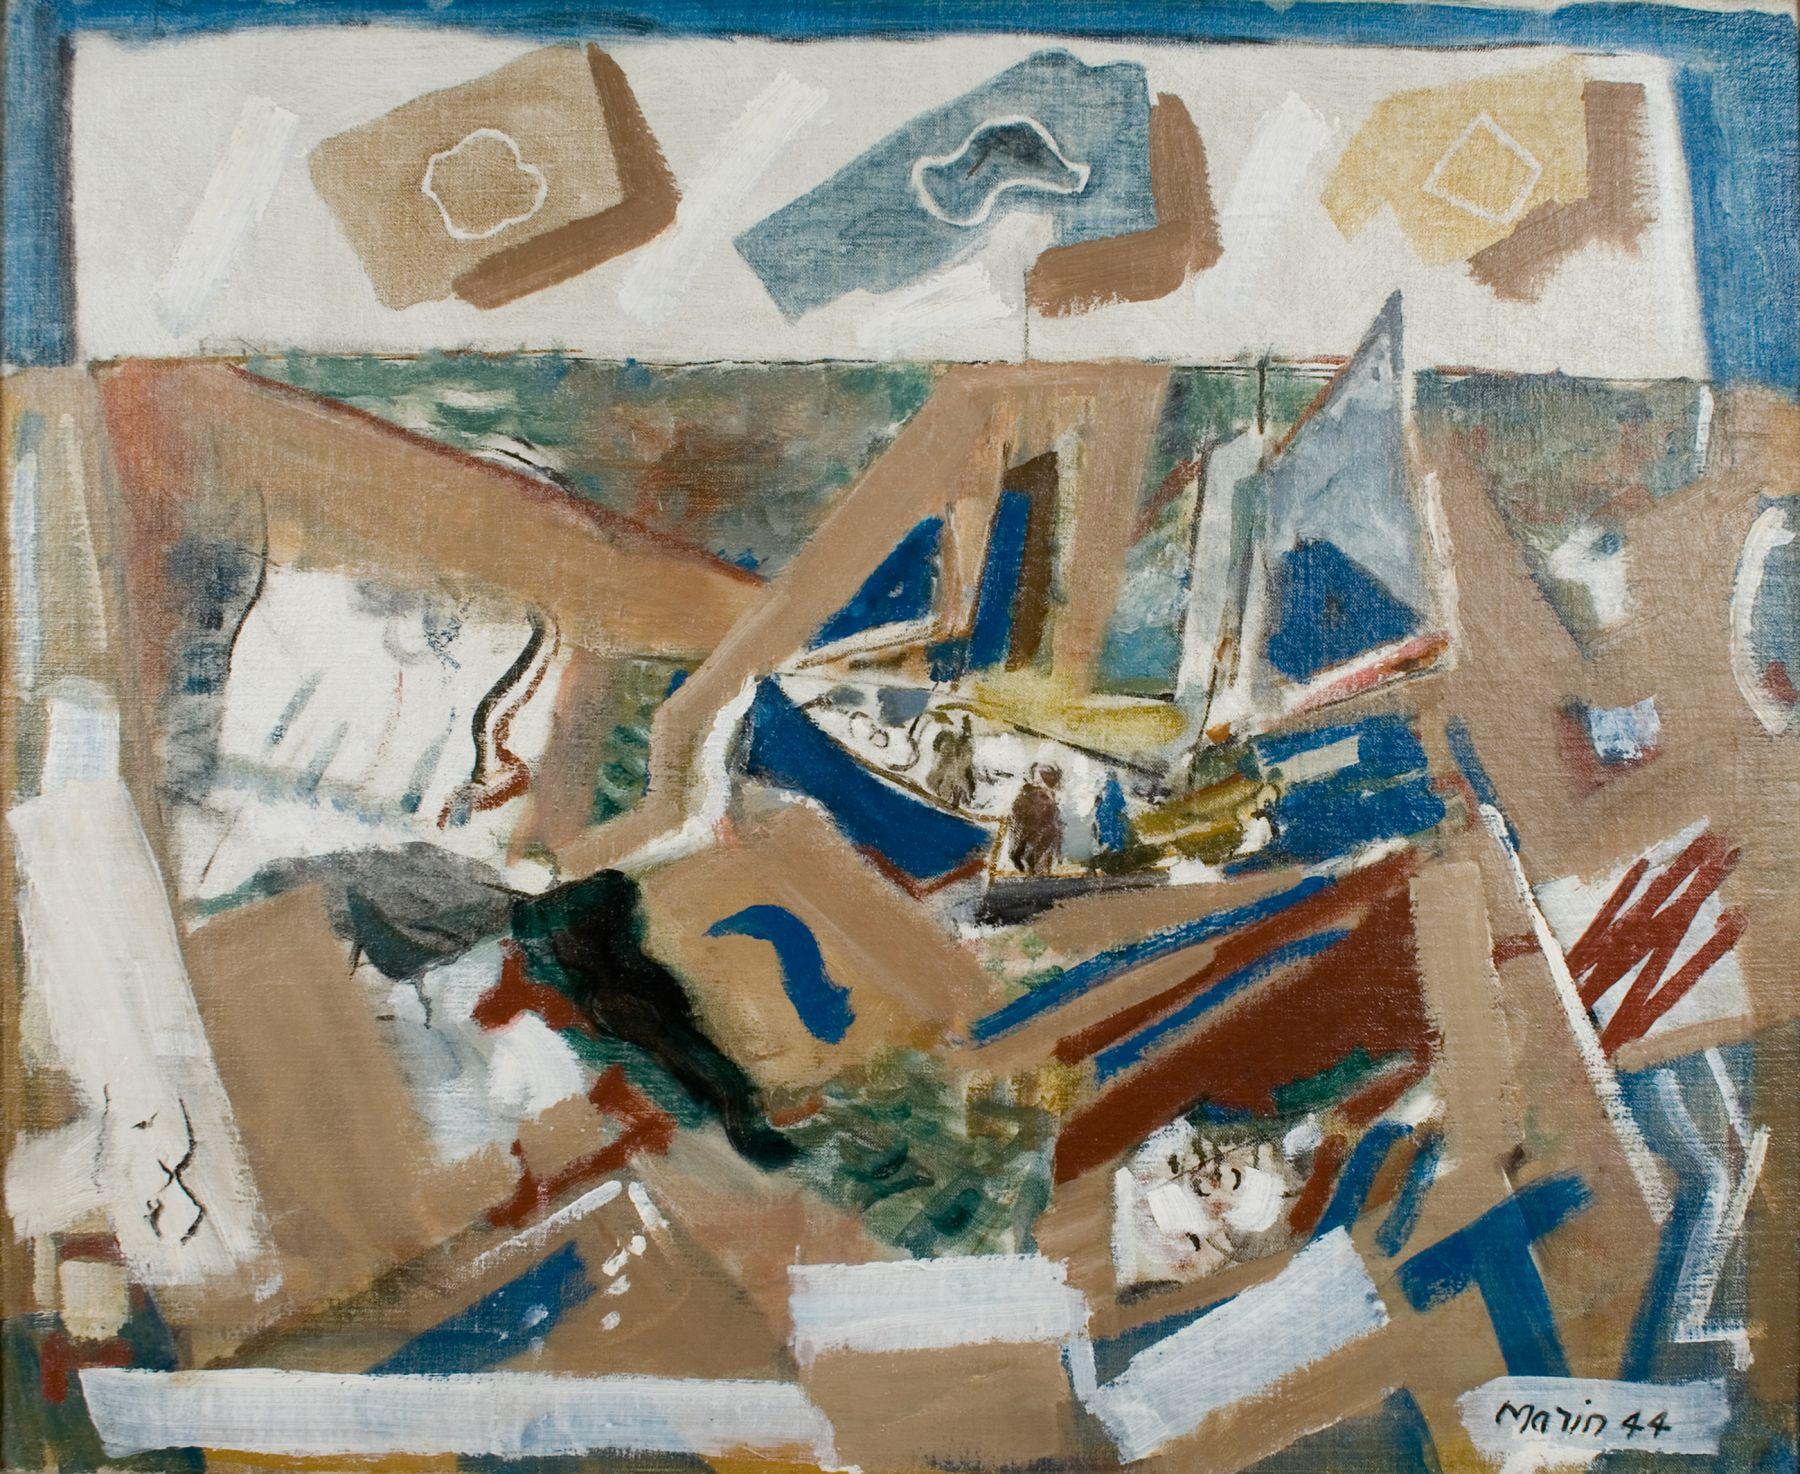 john marin, Sea and Boat Fantasy, 1944 oil on canvas 28 x 34 1/4 inches